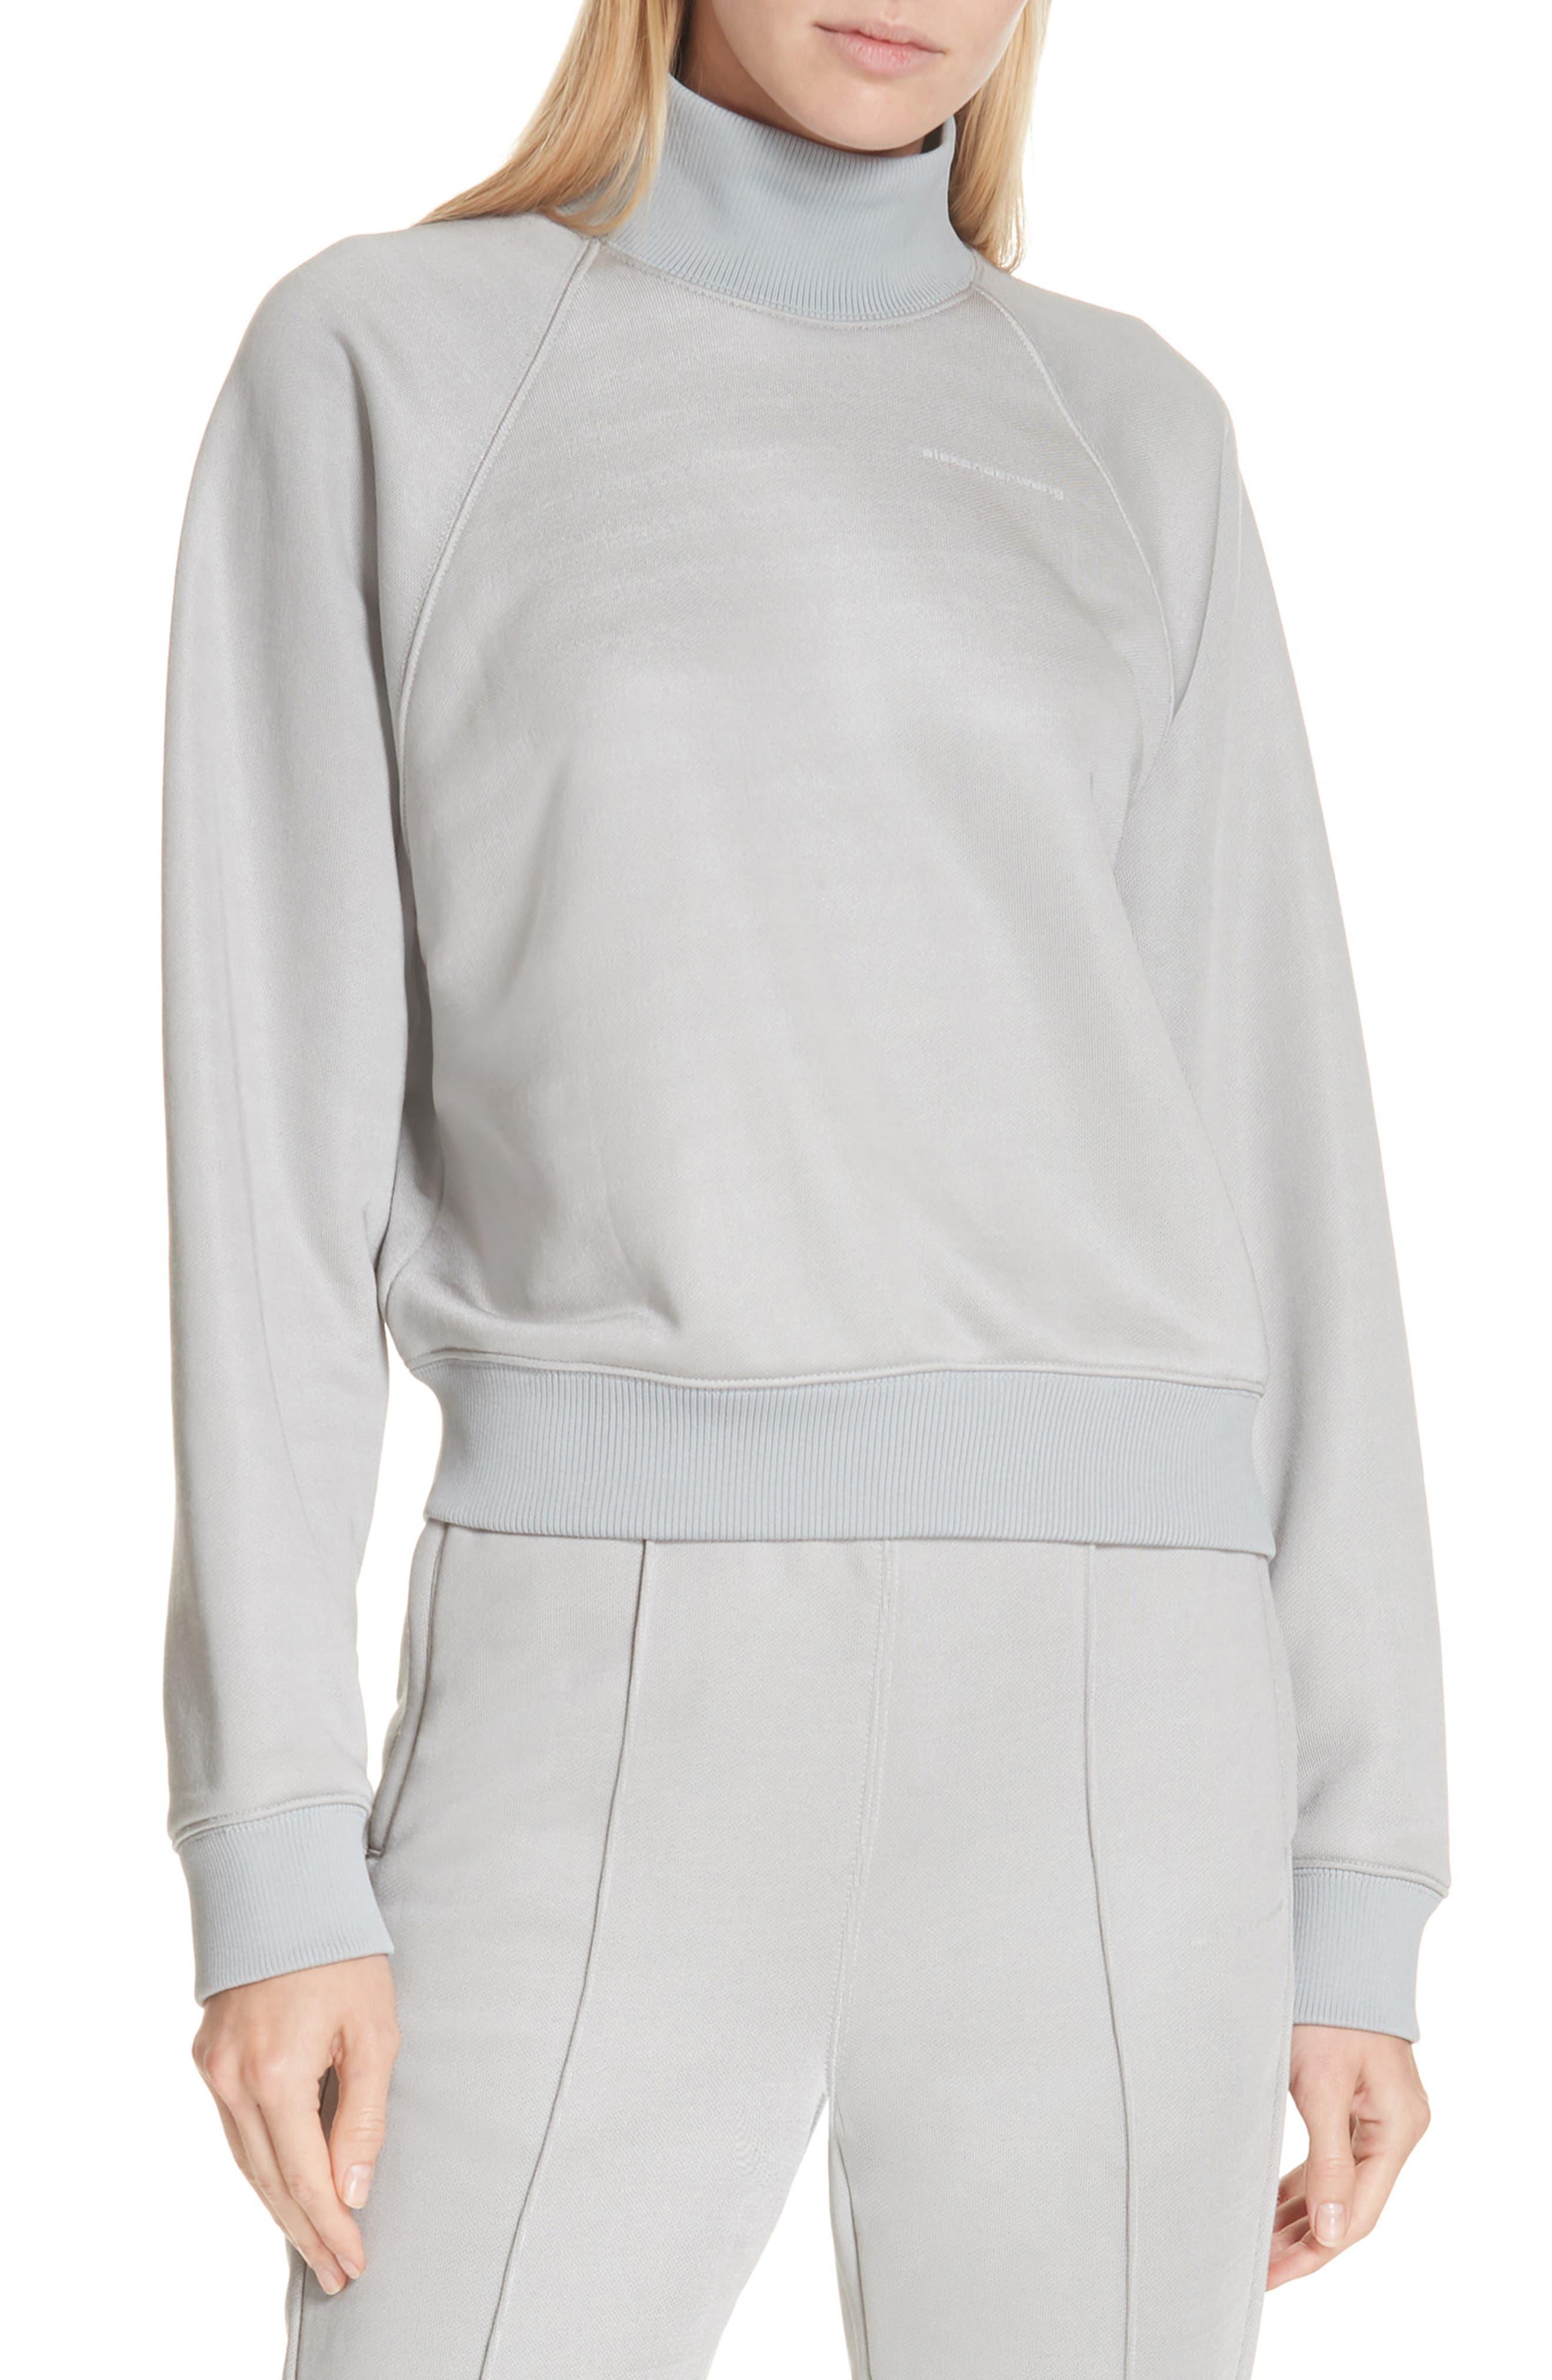 ALEXANDERWANG.T. French Terry Turtleneck Sweatshirt in Silver